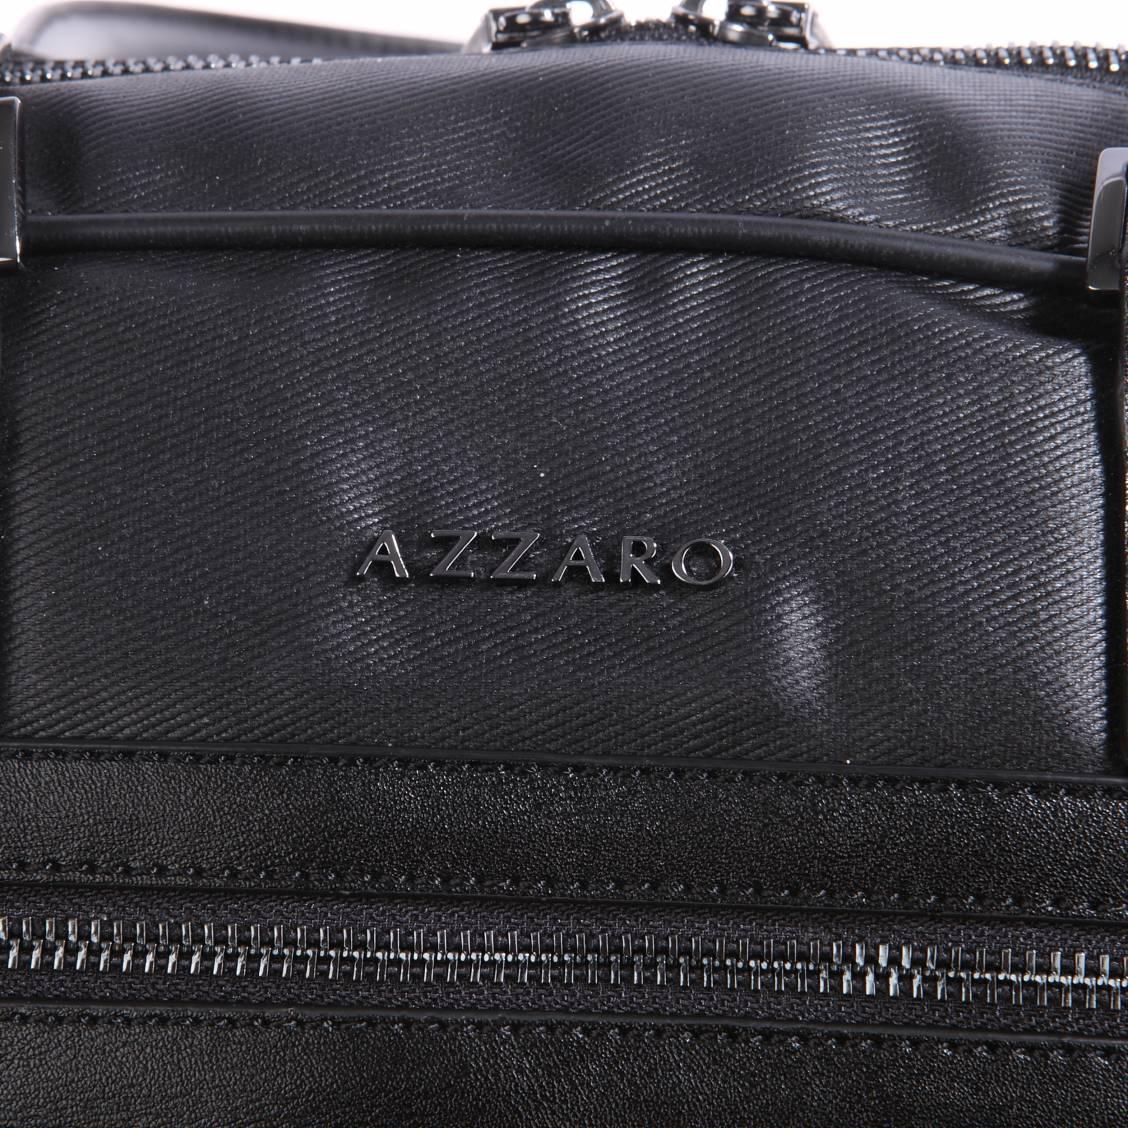 Porte-ordinateur Azzaro noir